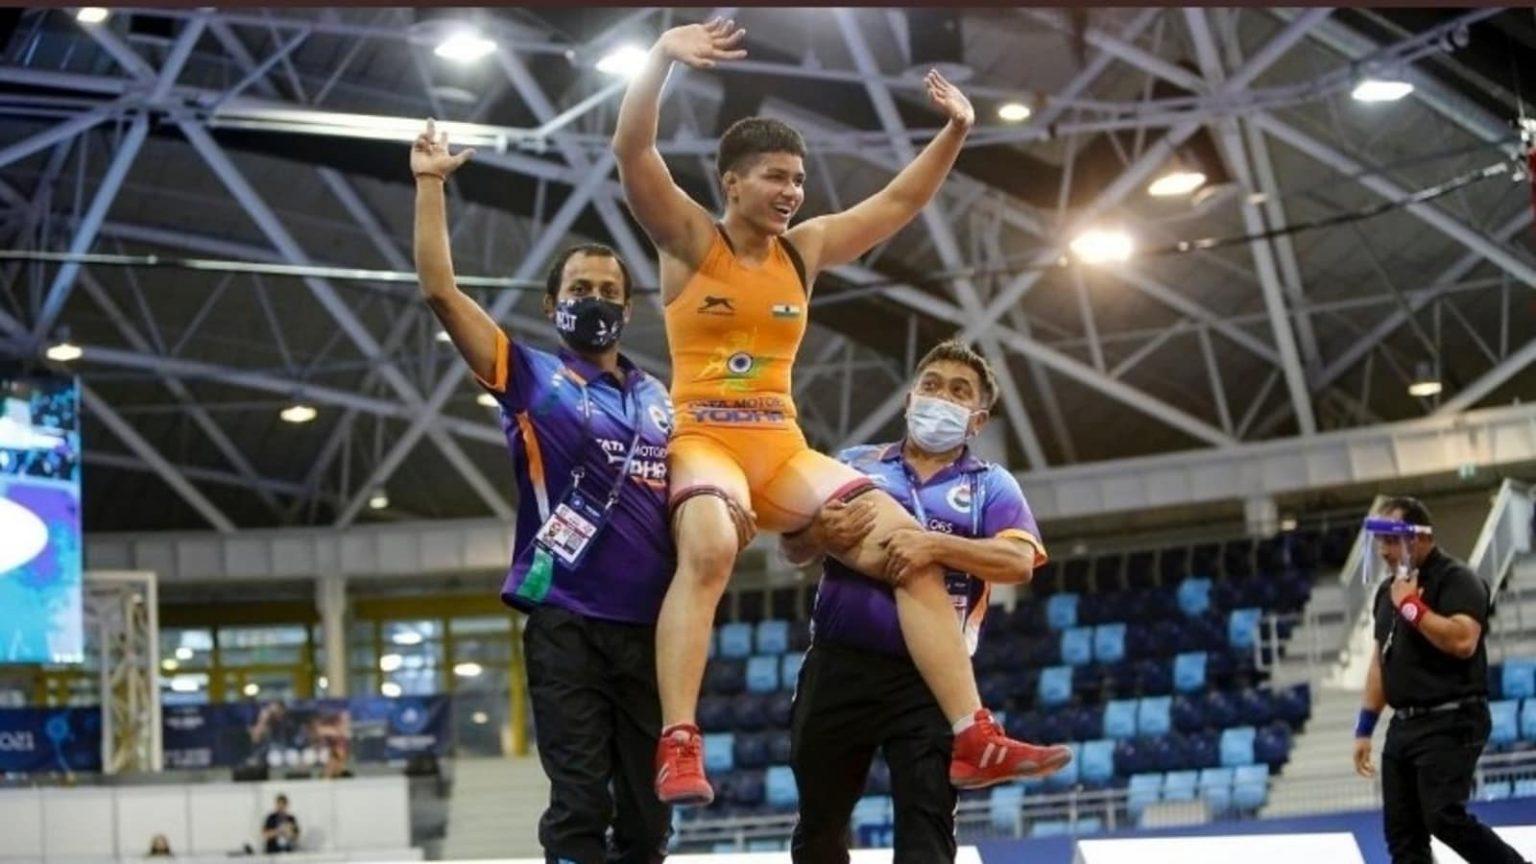 Priya Malik wins Gold at World Cadet Wrestling Championship| ലോക കേഡറ്റ് റെസ്ലിംഗ് ചാമ്പ്യൻഷിപ്പിൽ പ്രിയ മാലിക് സ്വർണം നേടി_40.1